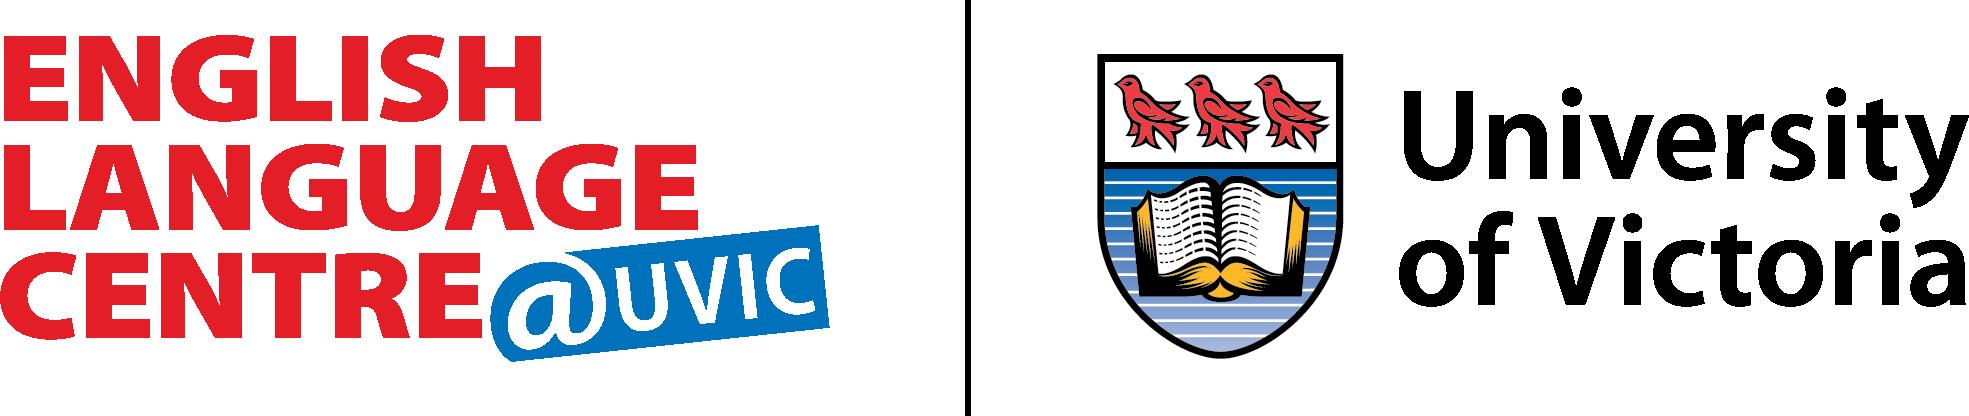 English Language Centre, University of Victoria